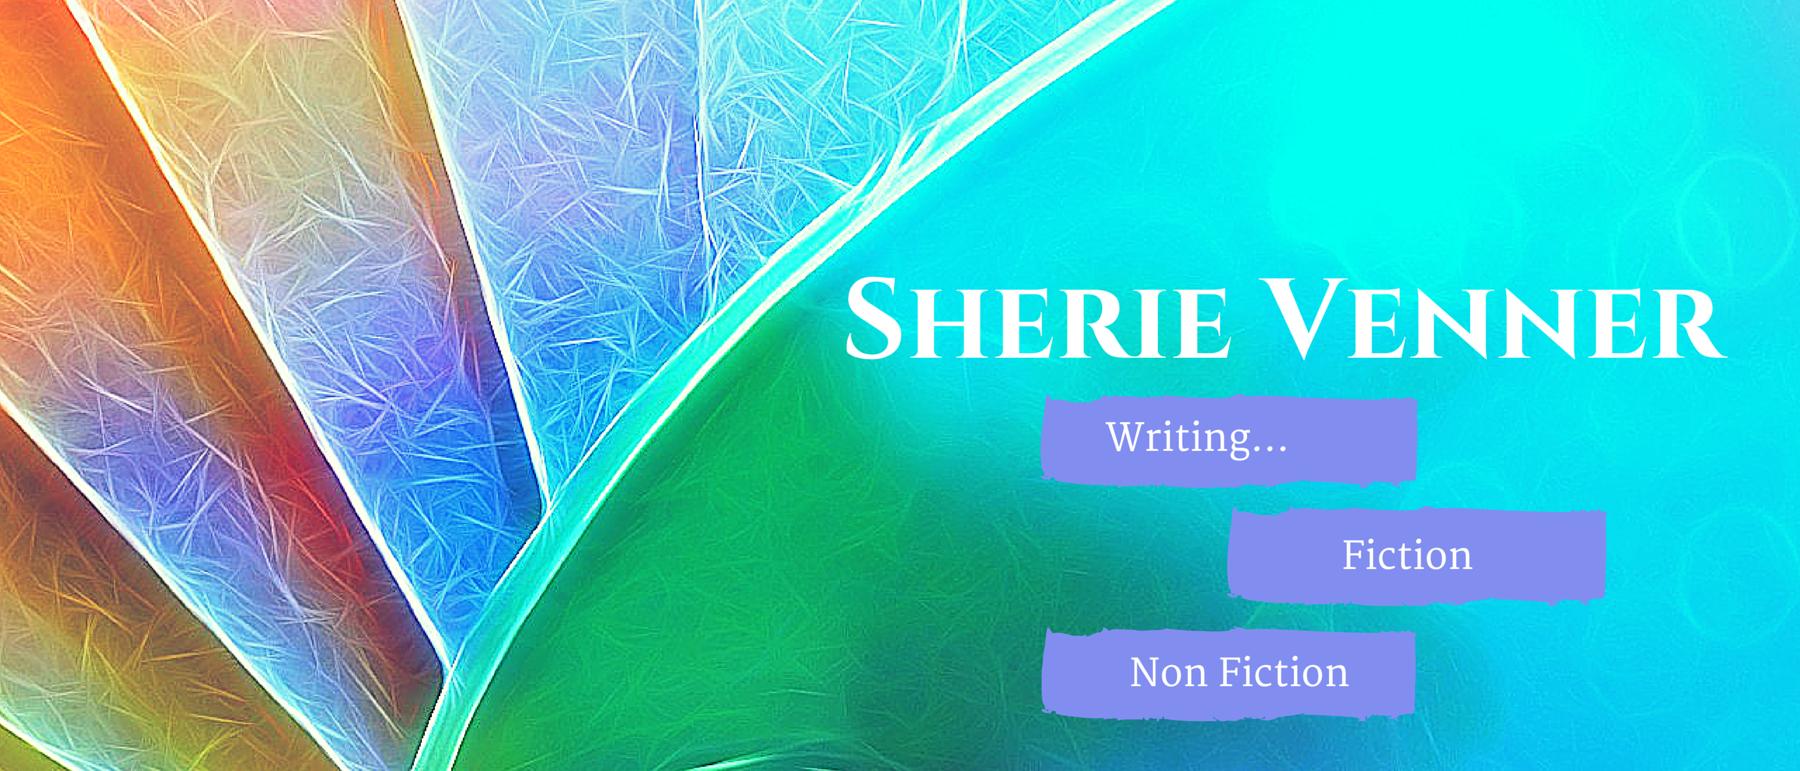 Sherie Venner | NLP Coach | Relationship Coach header image